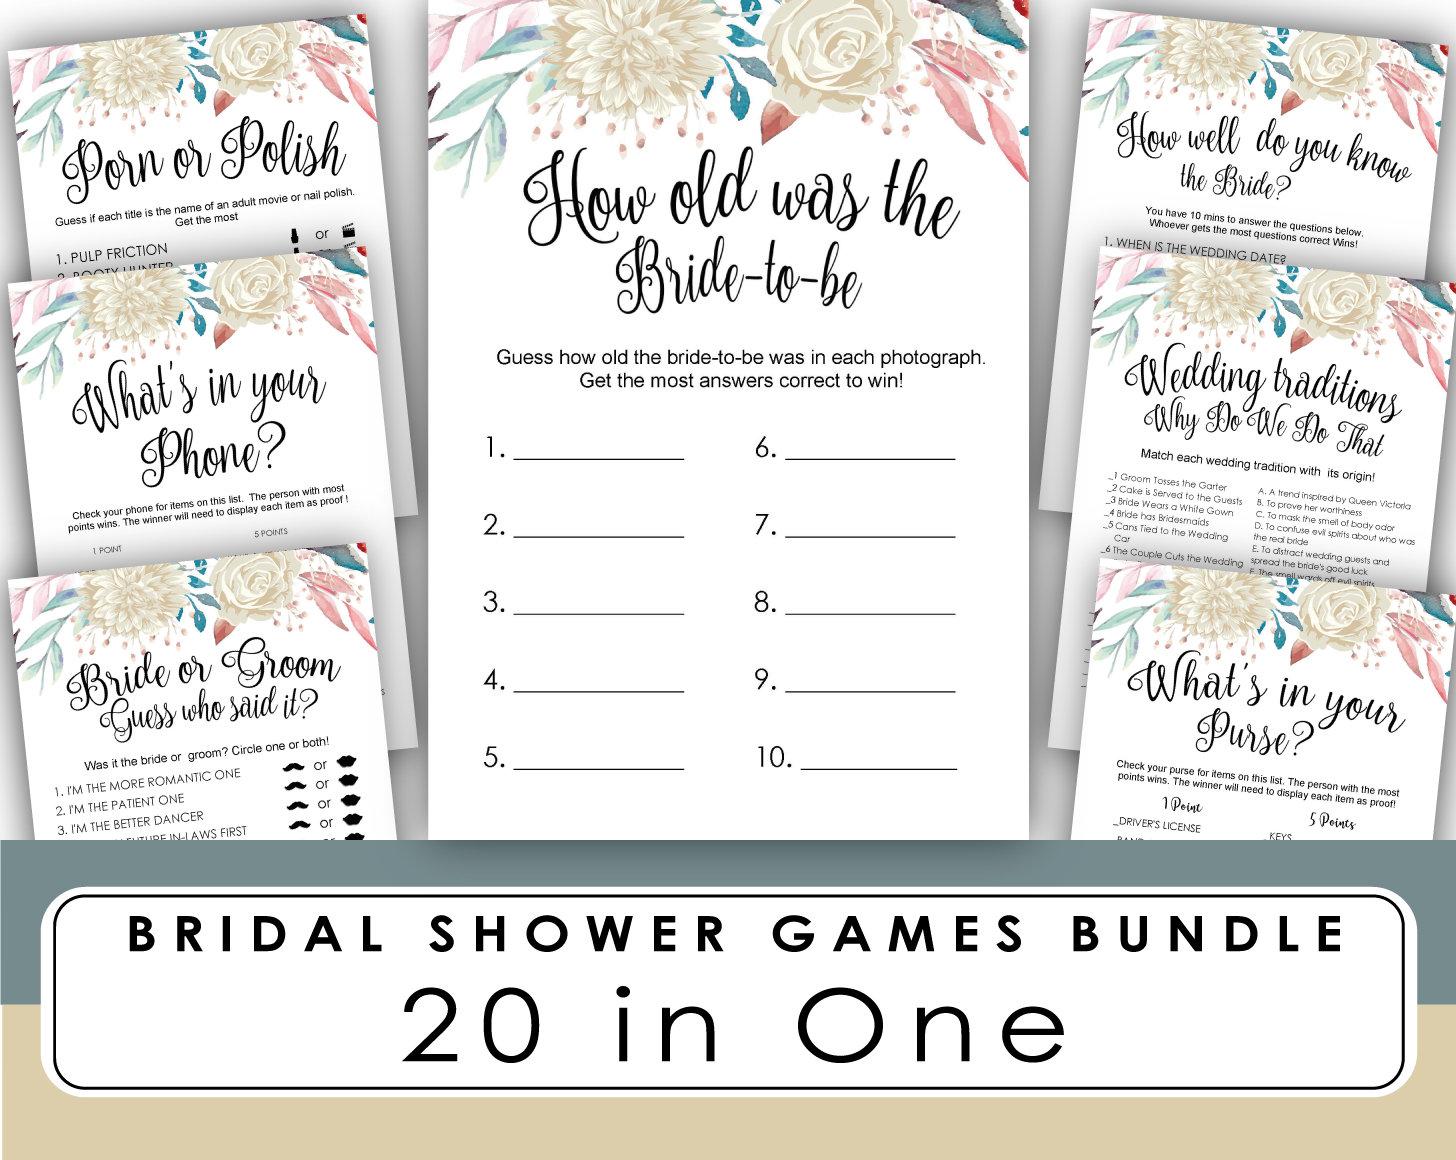 Bridal Shower Games Printable   Bridal Shower Games How old game   Romantic  bachelorette party   Wedding Shower games Disney